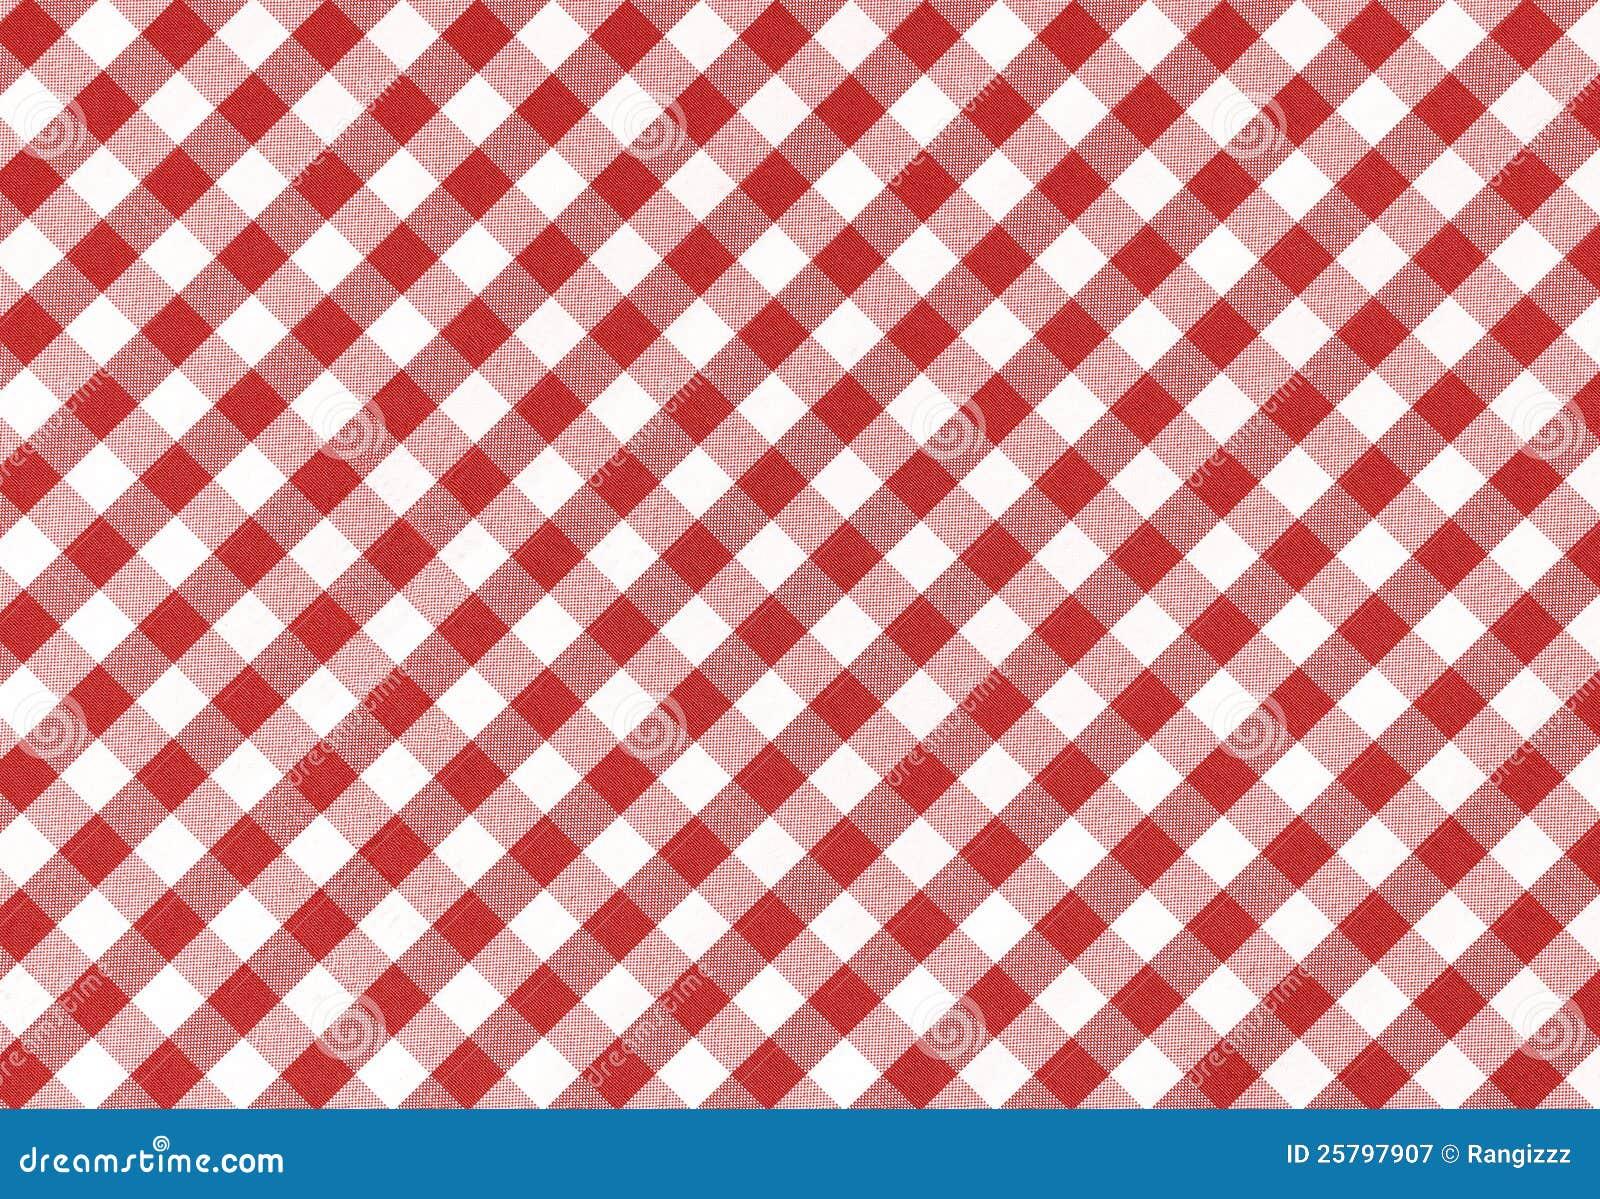 Table Cloth Background : Tablecloth Background Tablecloth background, texture